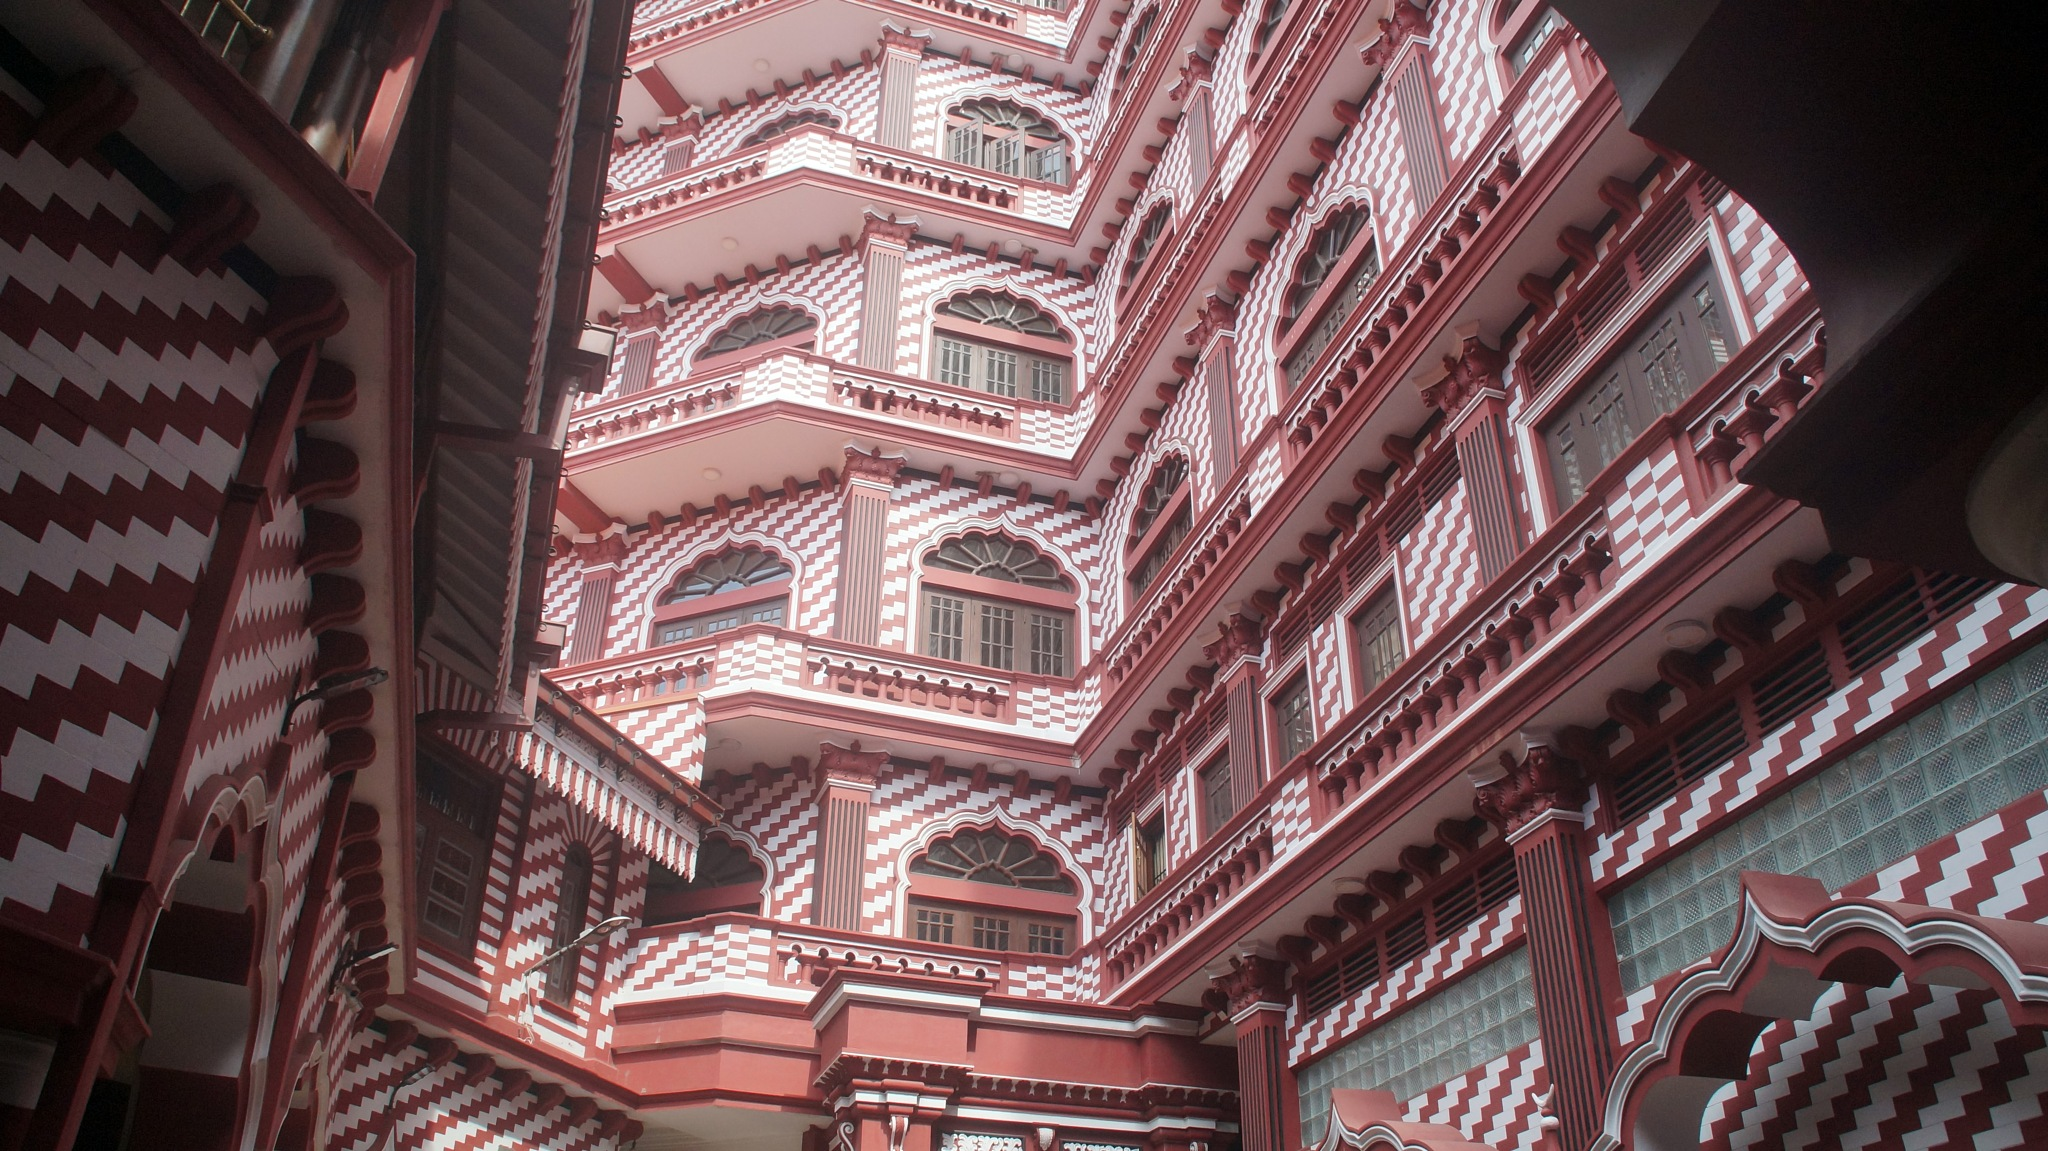 Red Mosque, Colombo, Sri Lanka 2018 by lars.erlandsson.9